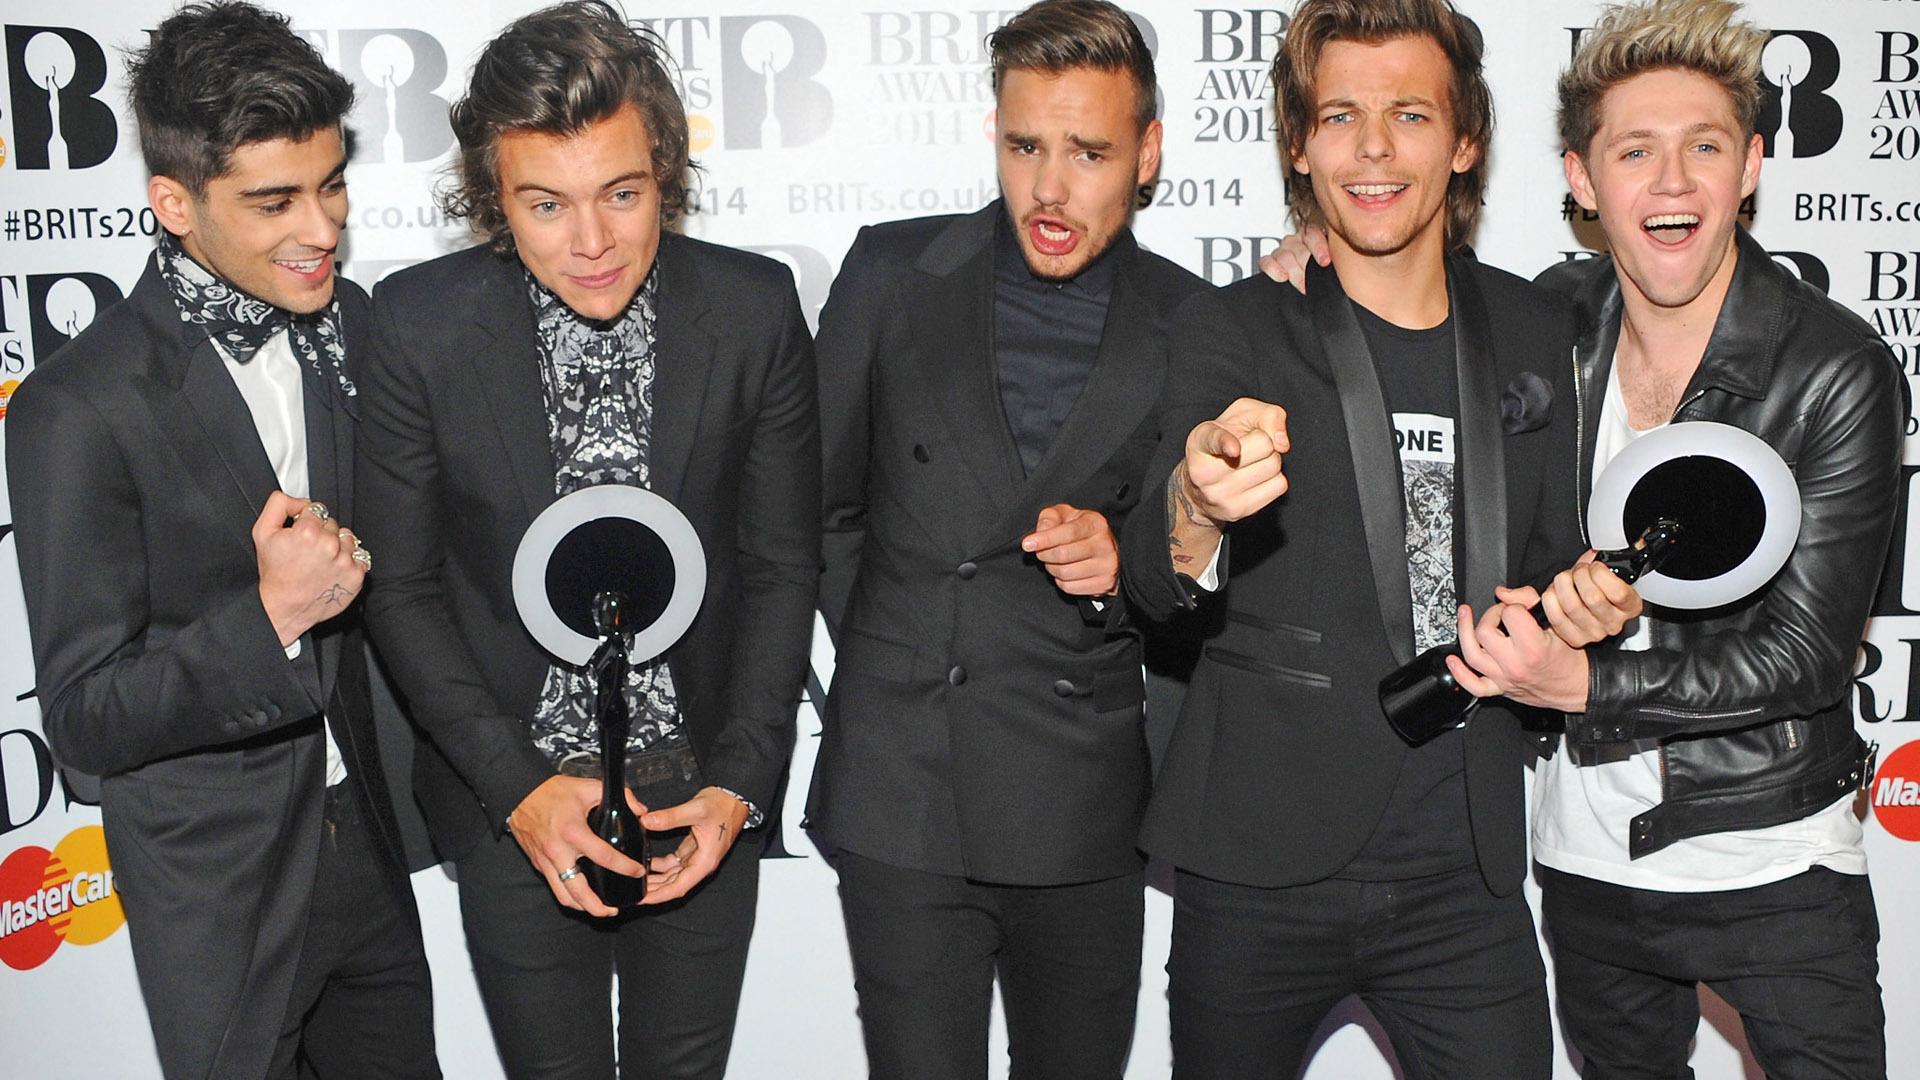 One Direction For Desktop Background